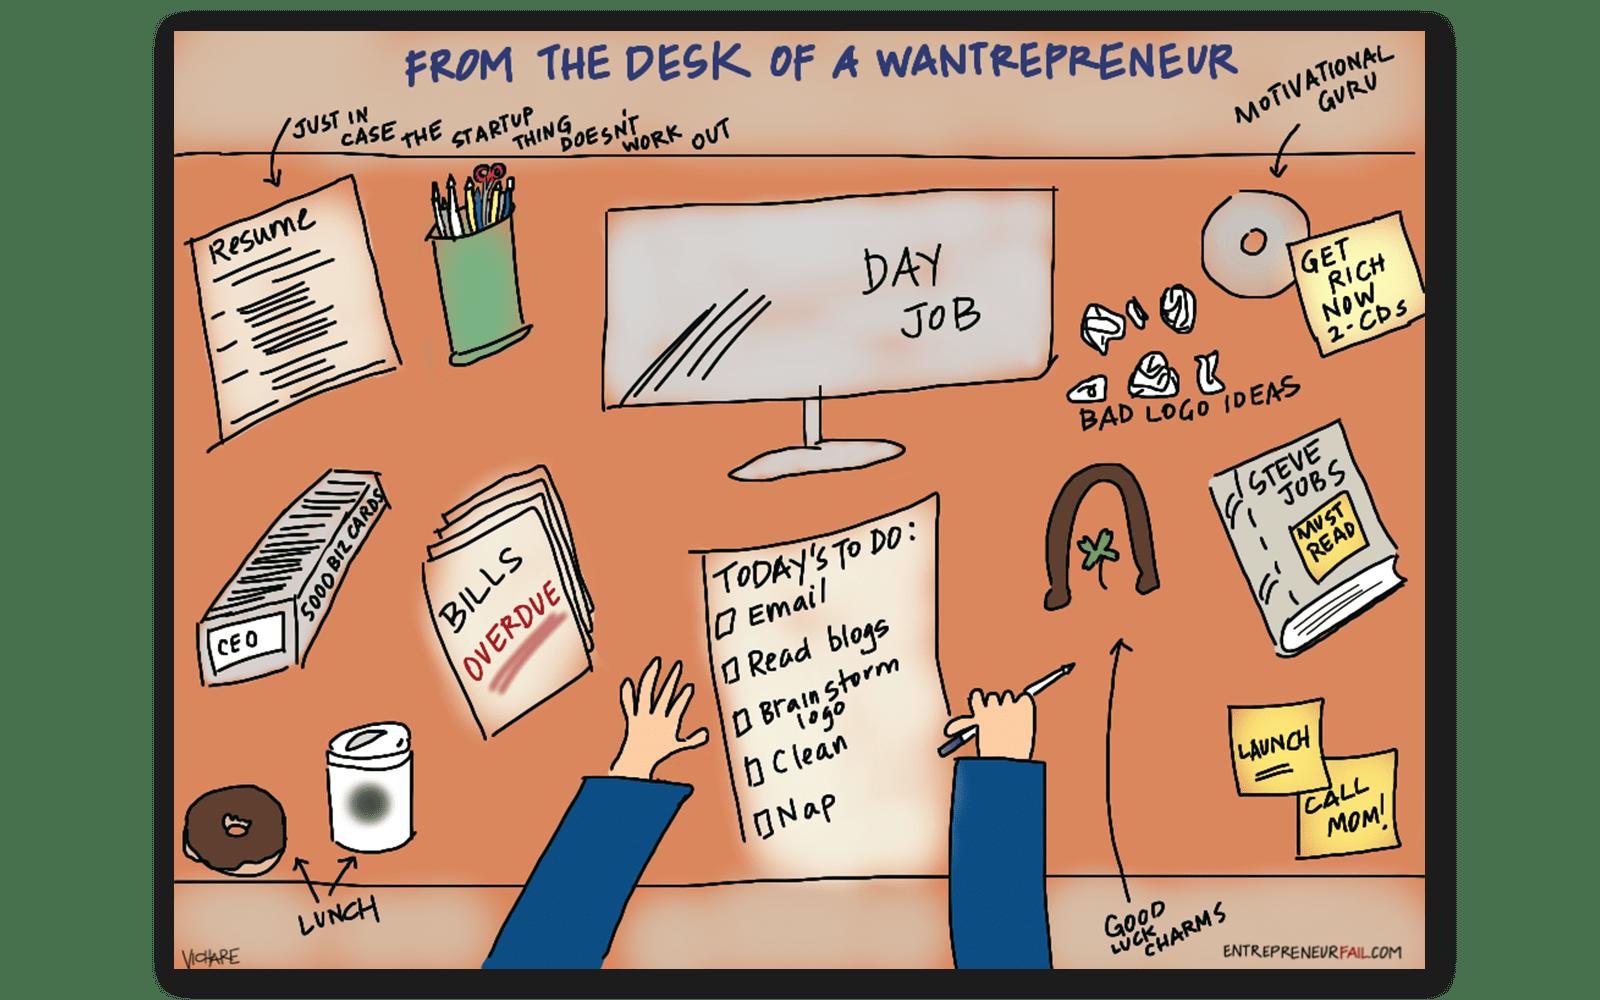 desk of a wantrepreneur